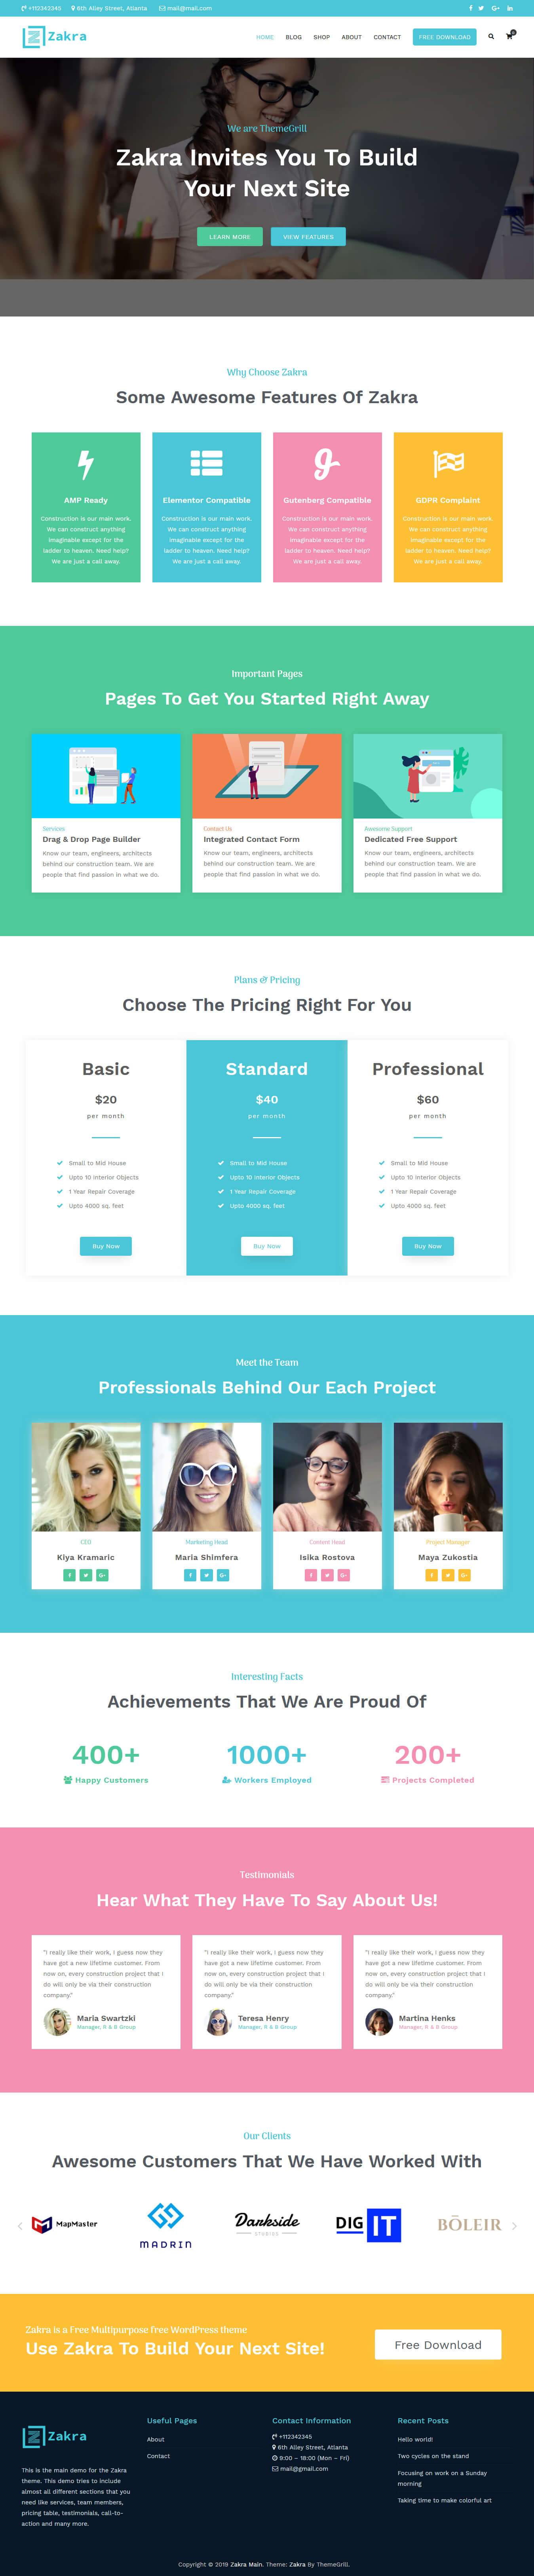 Zakra - Best Free Multipurpose WordPress Theme